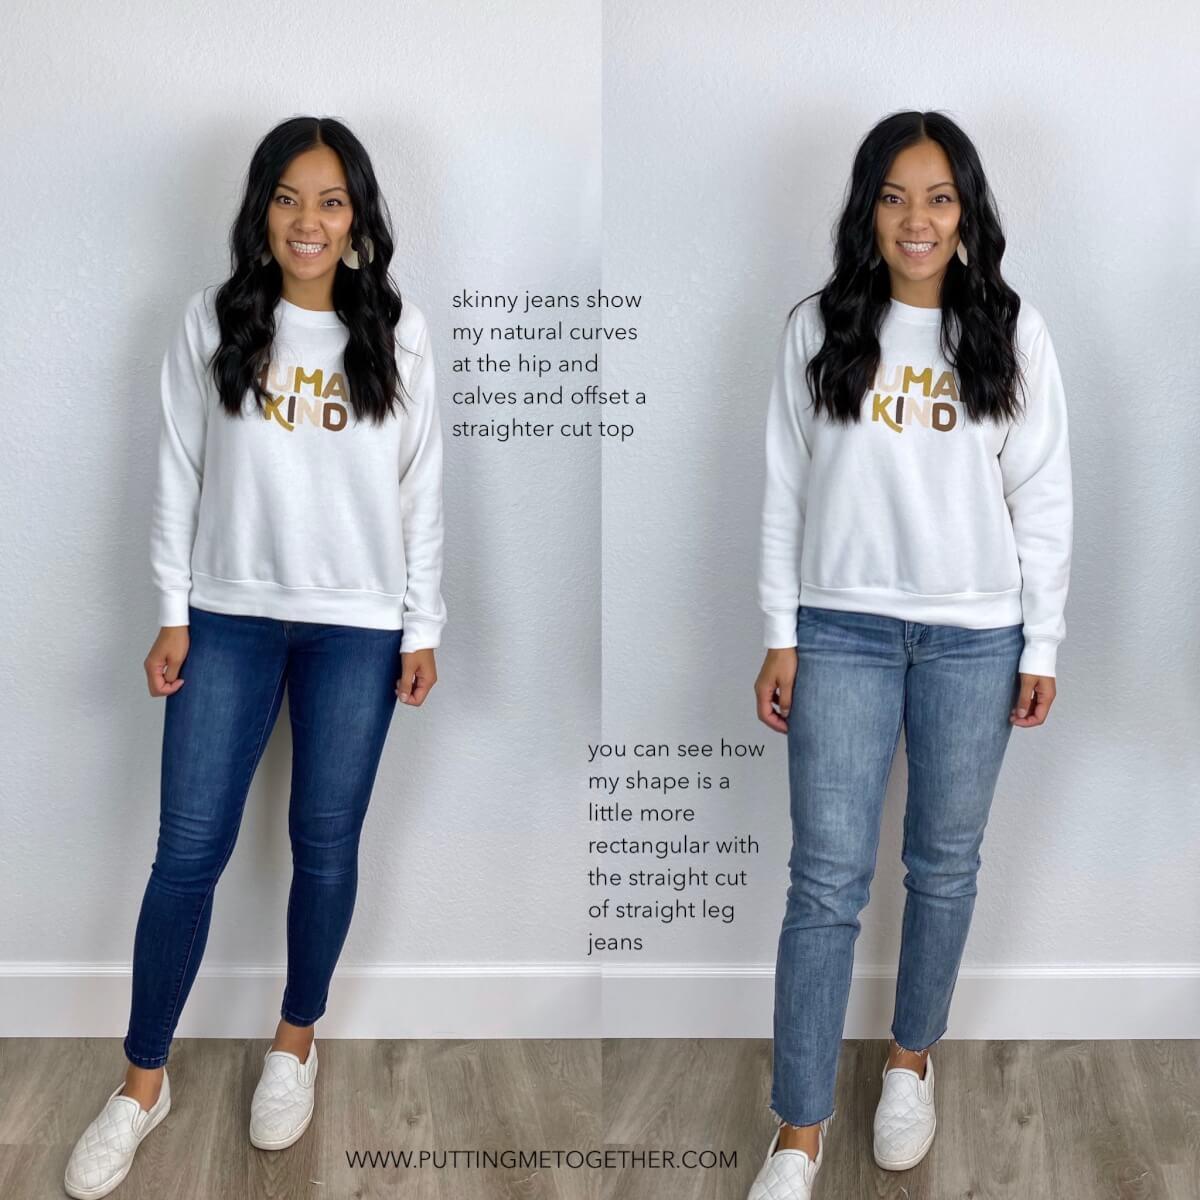 Skinny Jeans vs. Straight Leg Jeans: white sweatshirt, medium blue skinny jeans, light wash straight leg jeans, white slip-on sneakers, white earrings